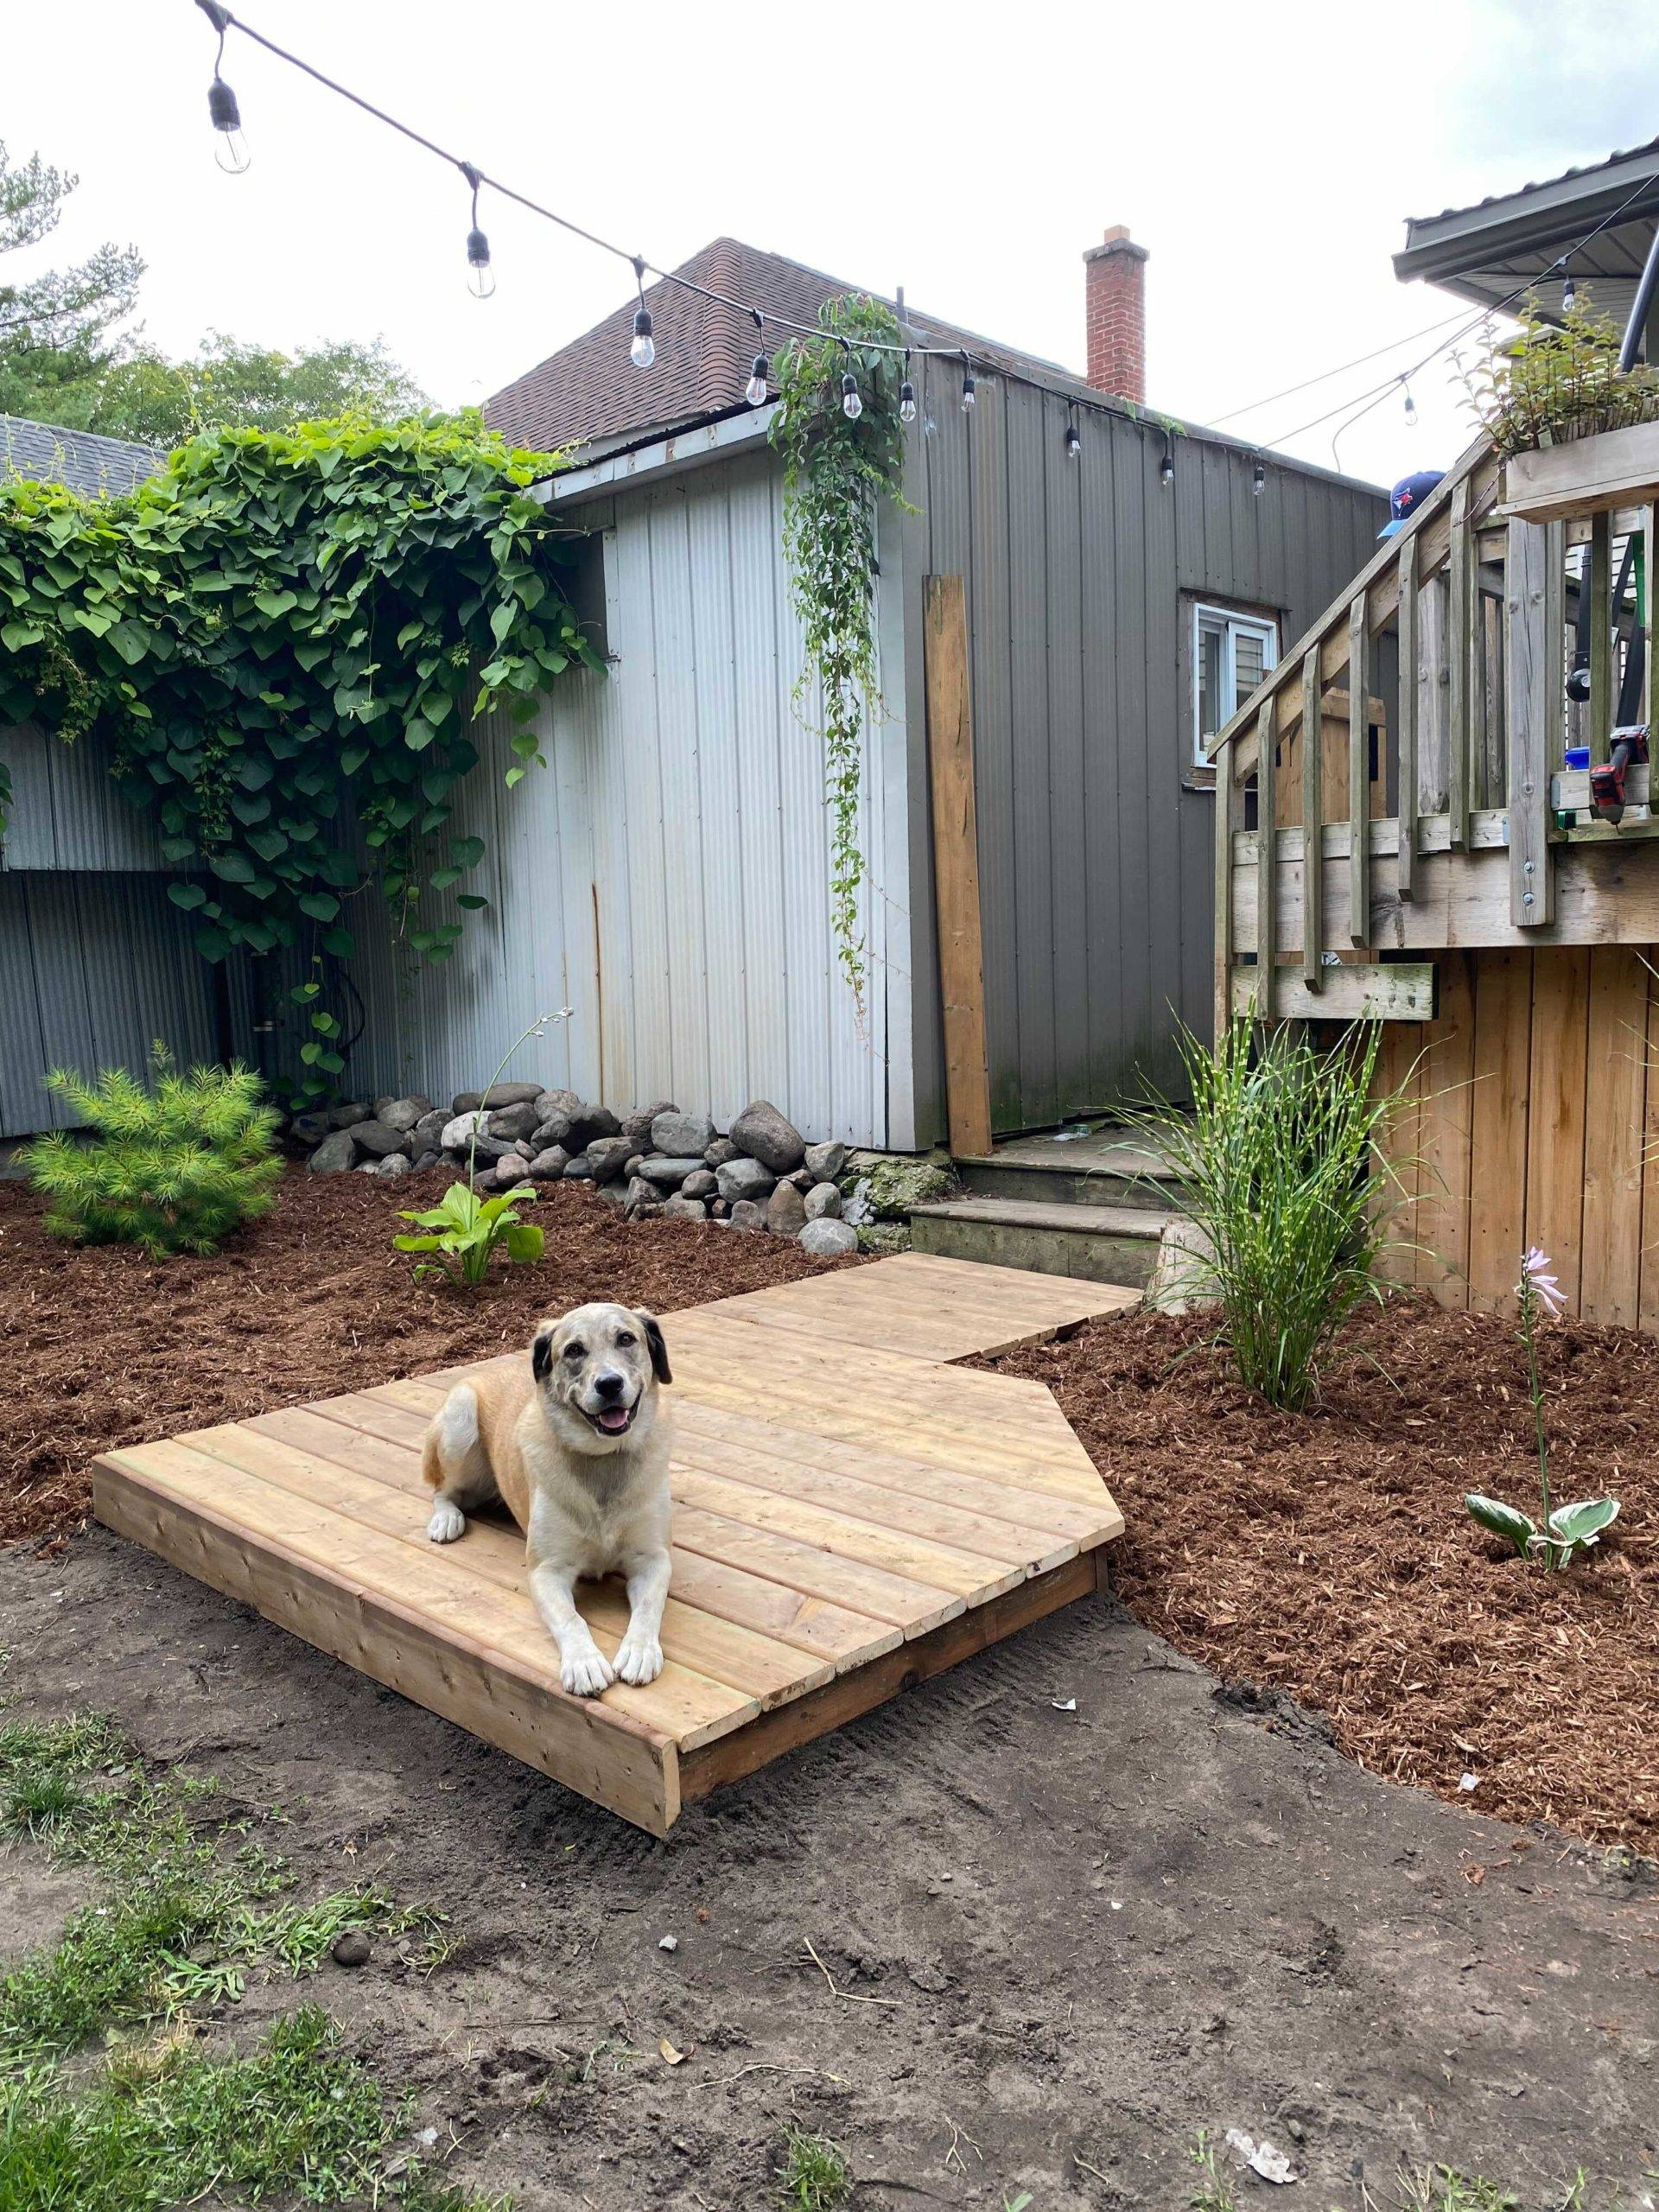 dog sitting on boardwalk in backyard